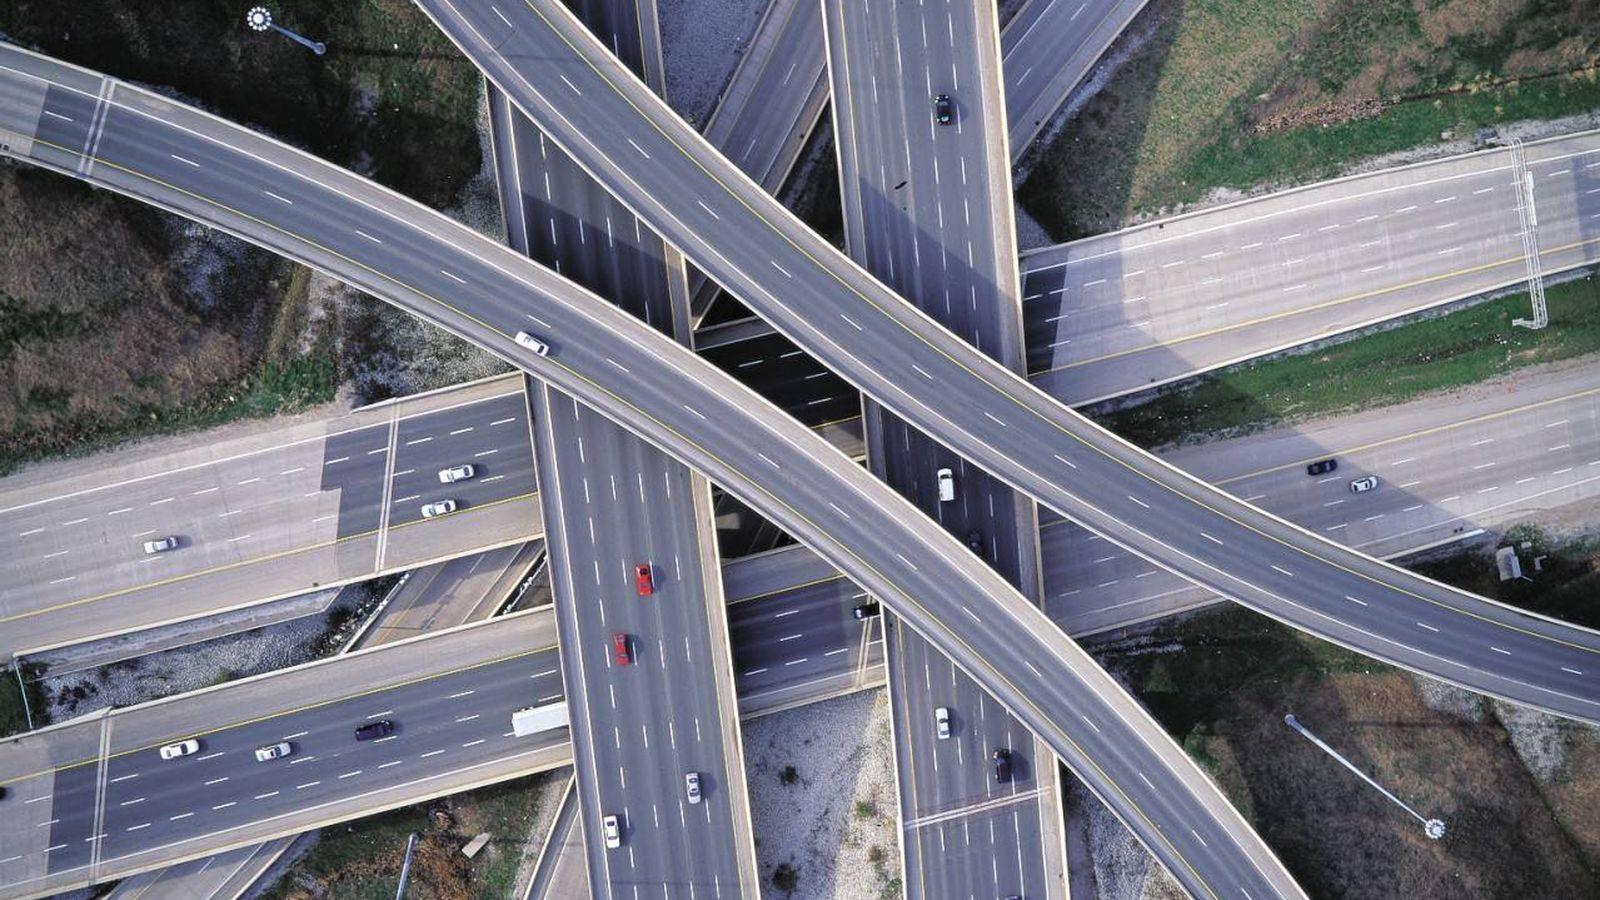 Foto: Autopista 407 ETR en Toronto (Canadá)